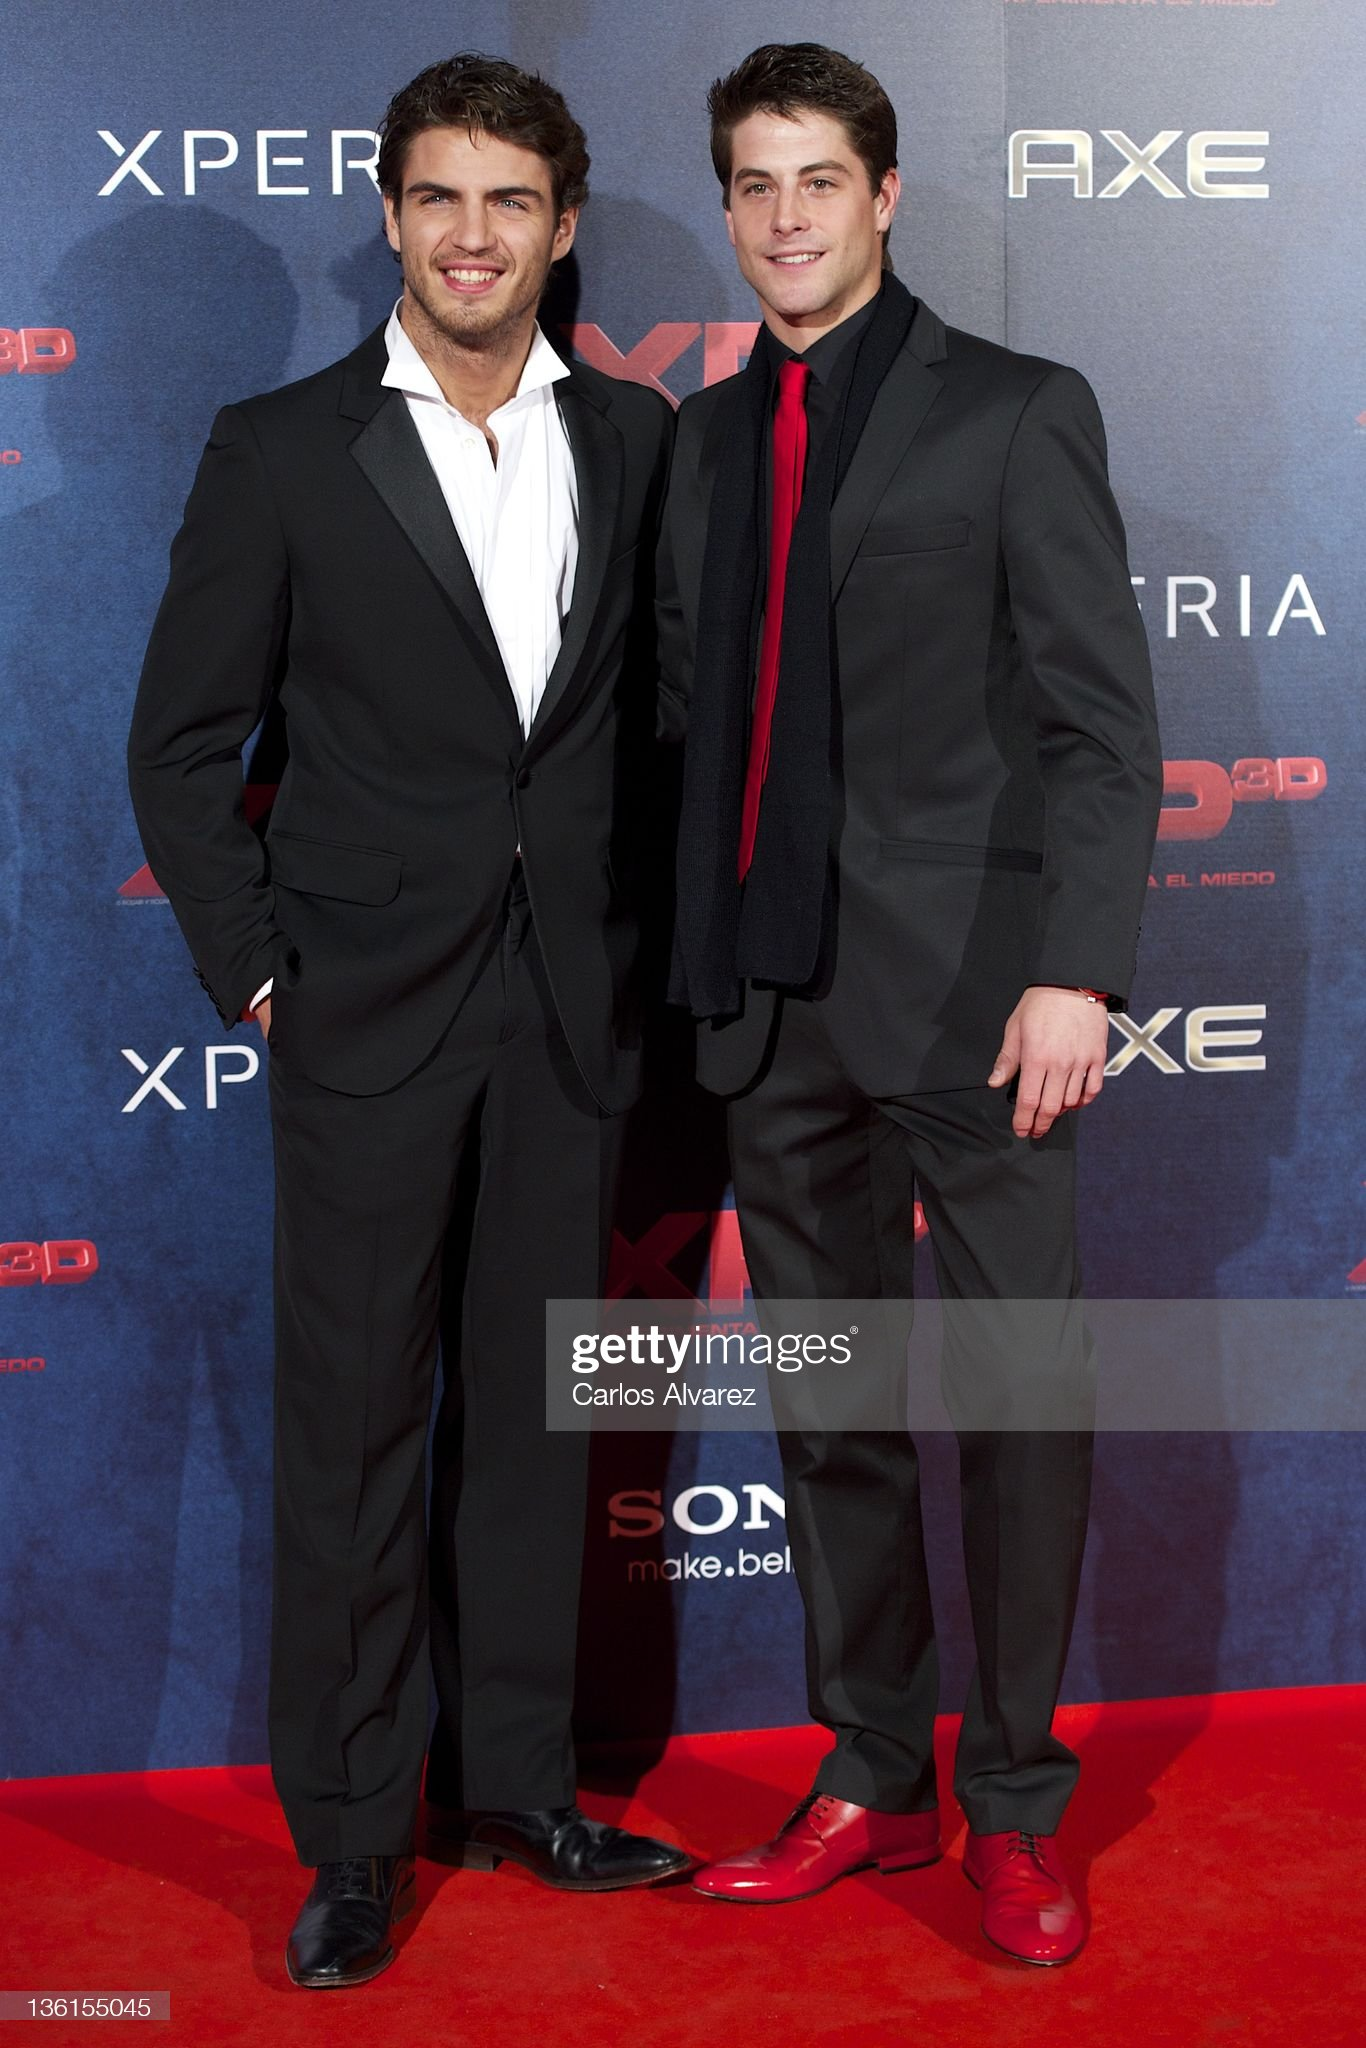 ¿Cuánto mide Luis Fernández? (Actor) - Altura Actors-maxi-iglesias-and-luis-fernandez-attend-xp3d-premiere-at-the-picture-id136155045?s=2048x2048